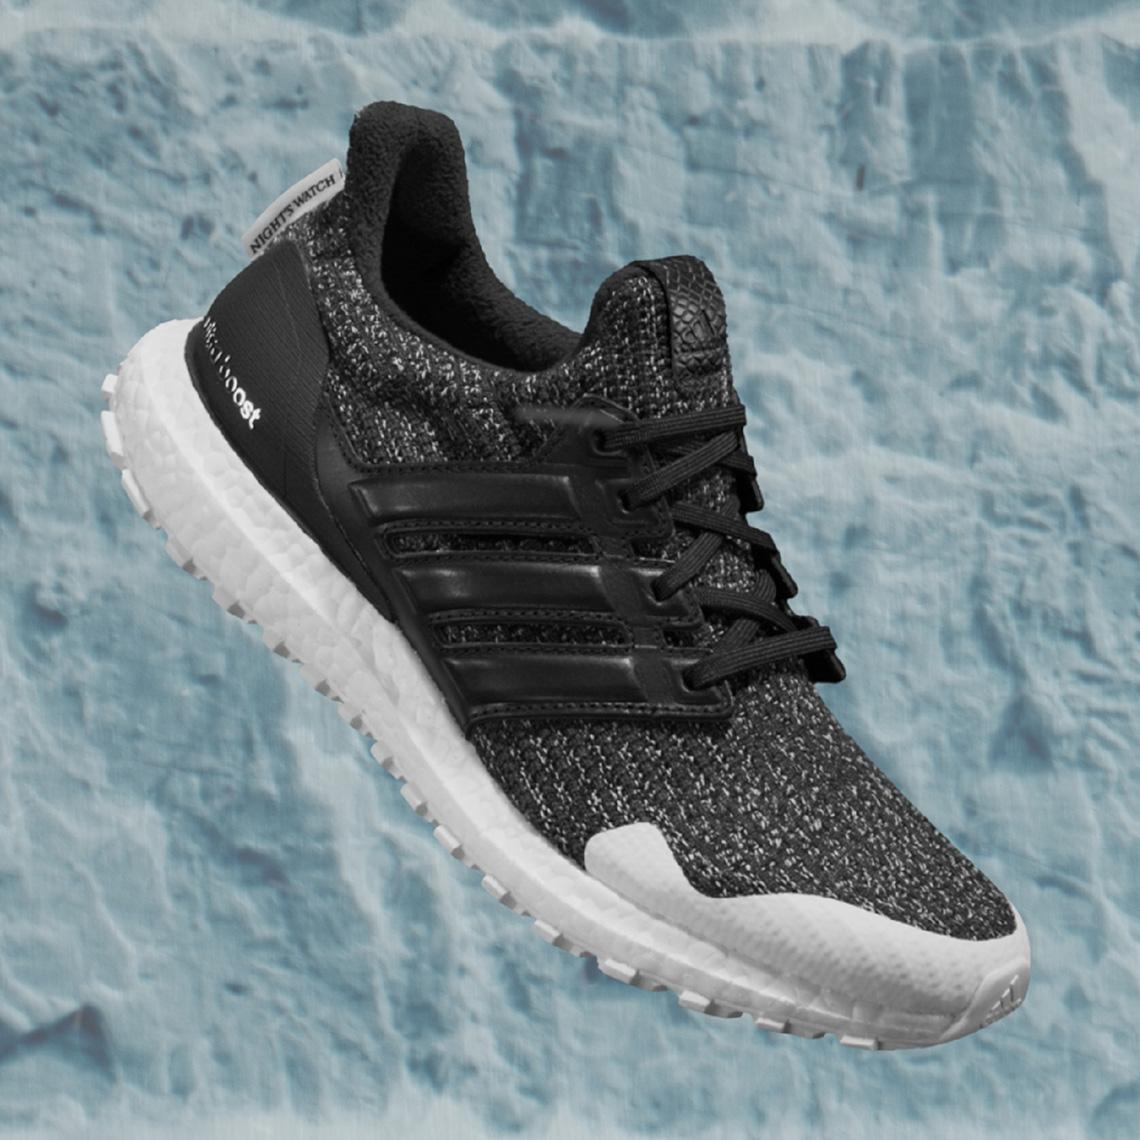 Boys Adidas Shoes - Ready to Use eCommerce Website